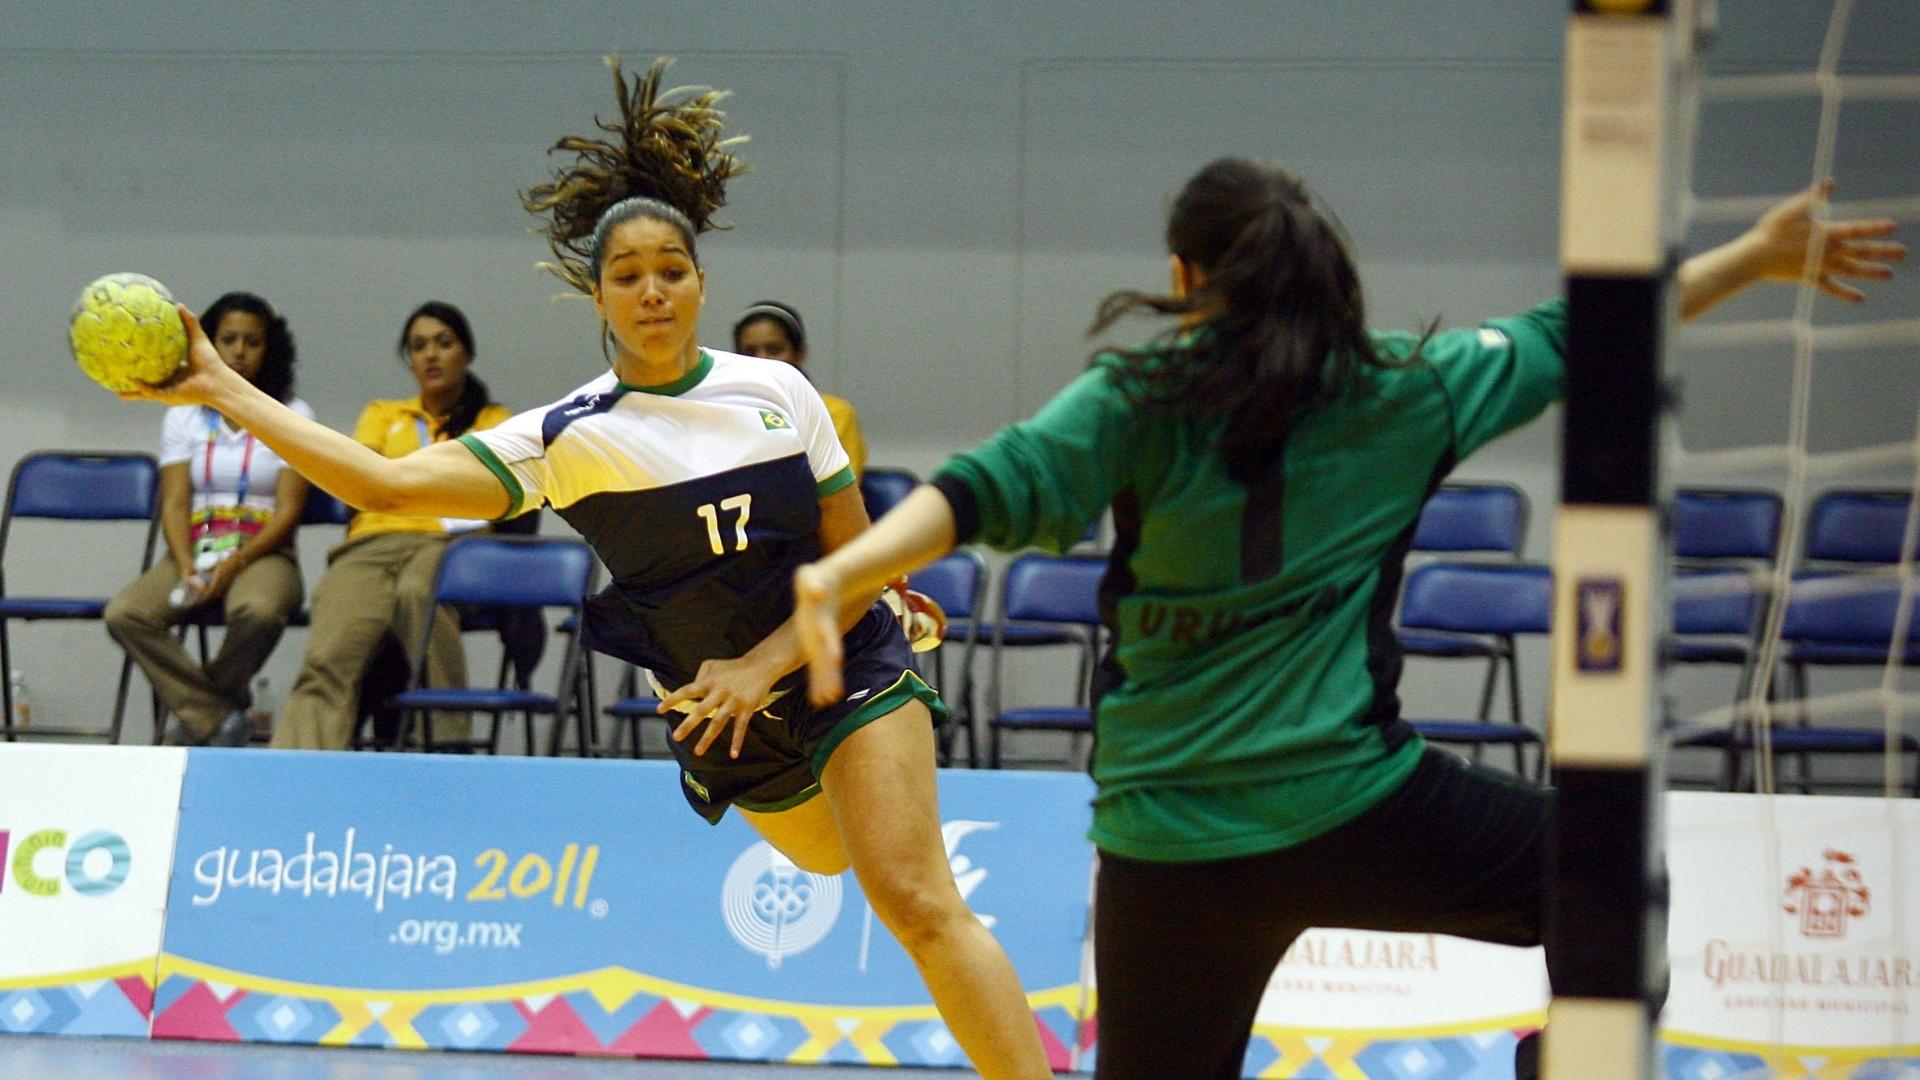 Brasileira salta para arremessar na partida contra o Uruguai, na segunda rodada do Pan-2011 (17/10/2011)